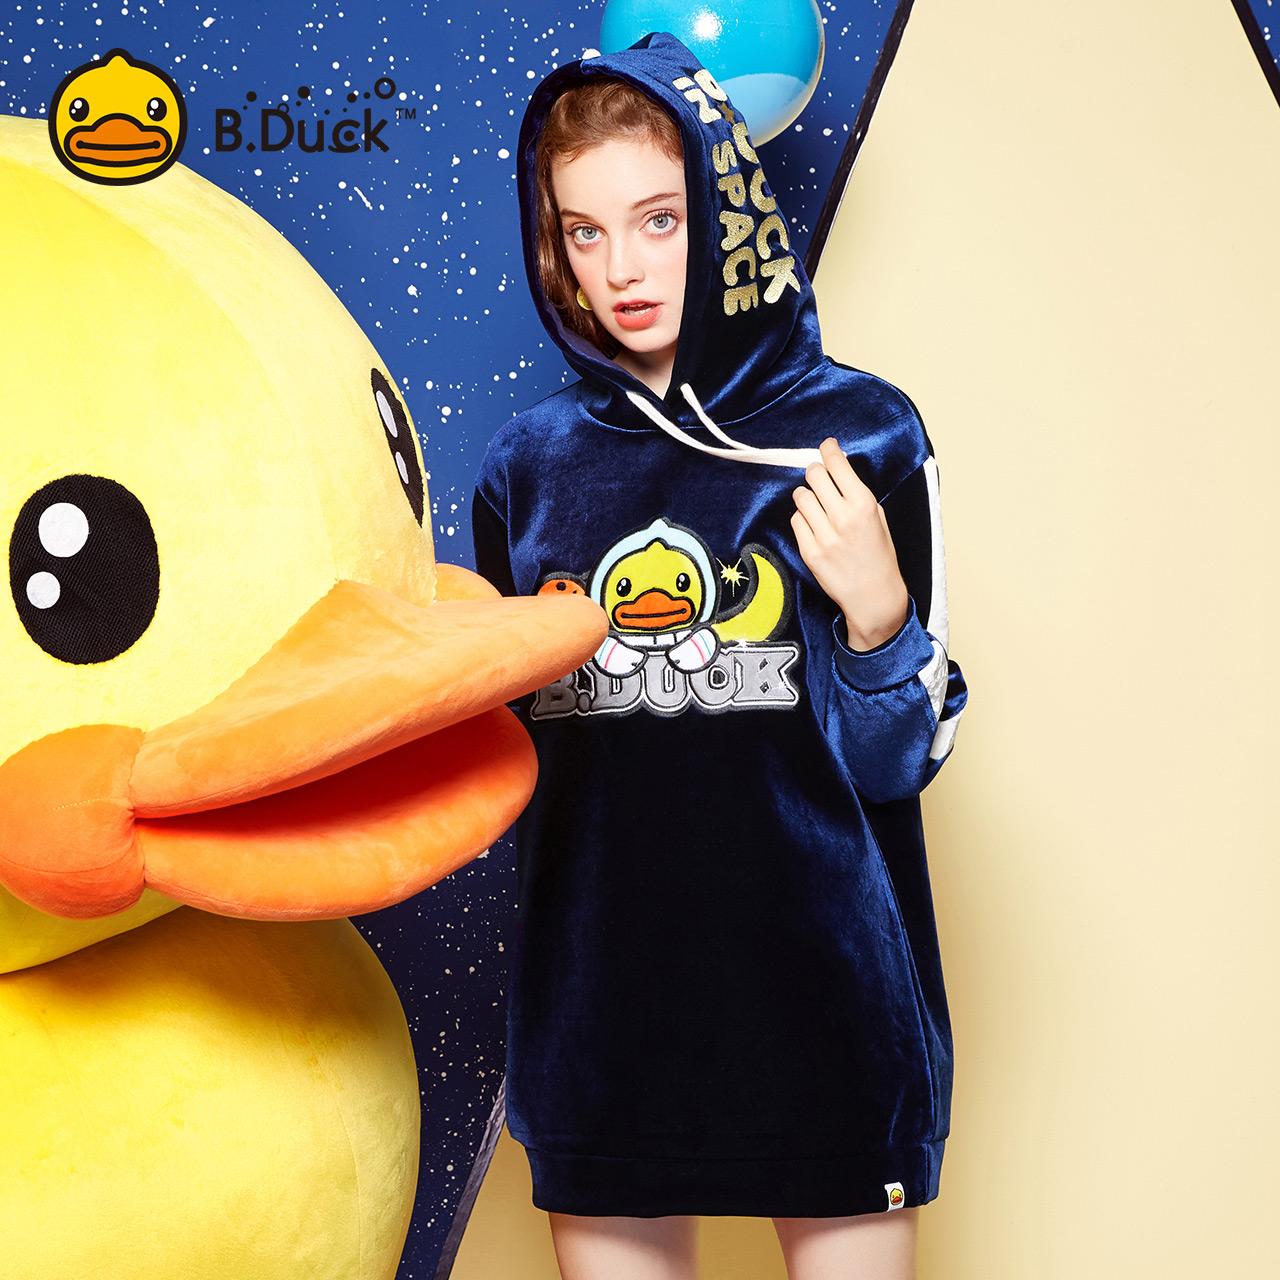 B.Duck小黄鸭女装2017秋季新款丝绒原宿风chic中长款连帽卫衣潮1元优惠券